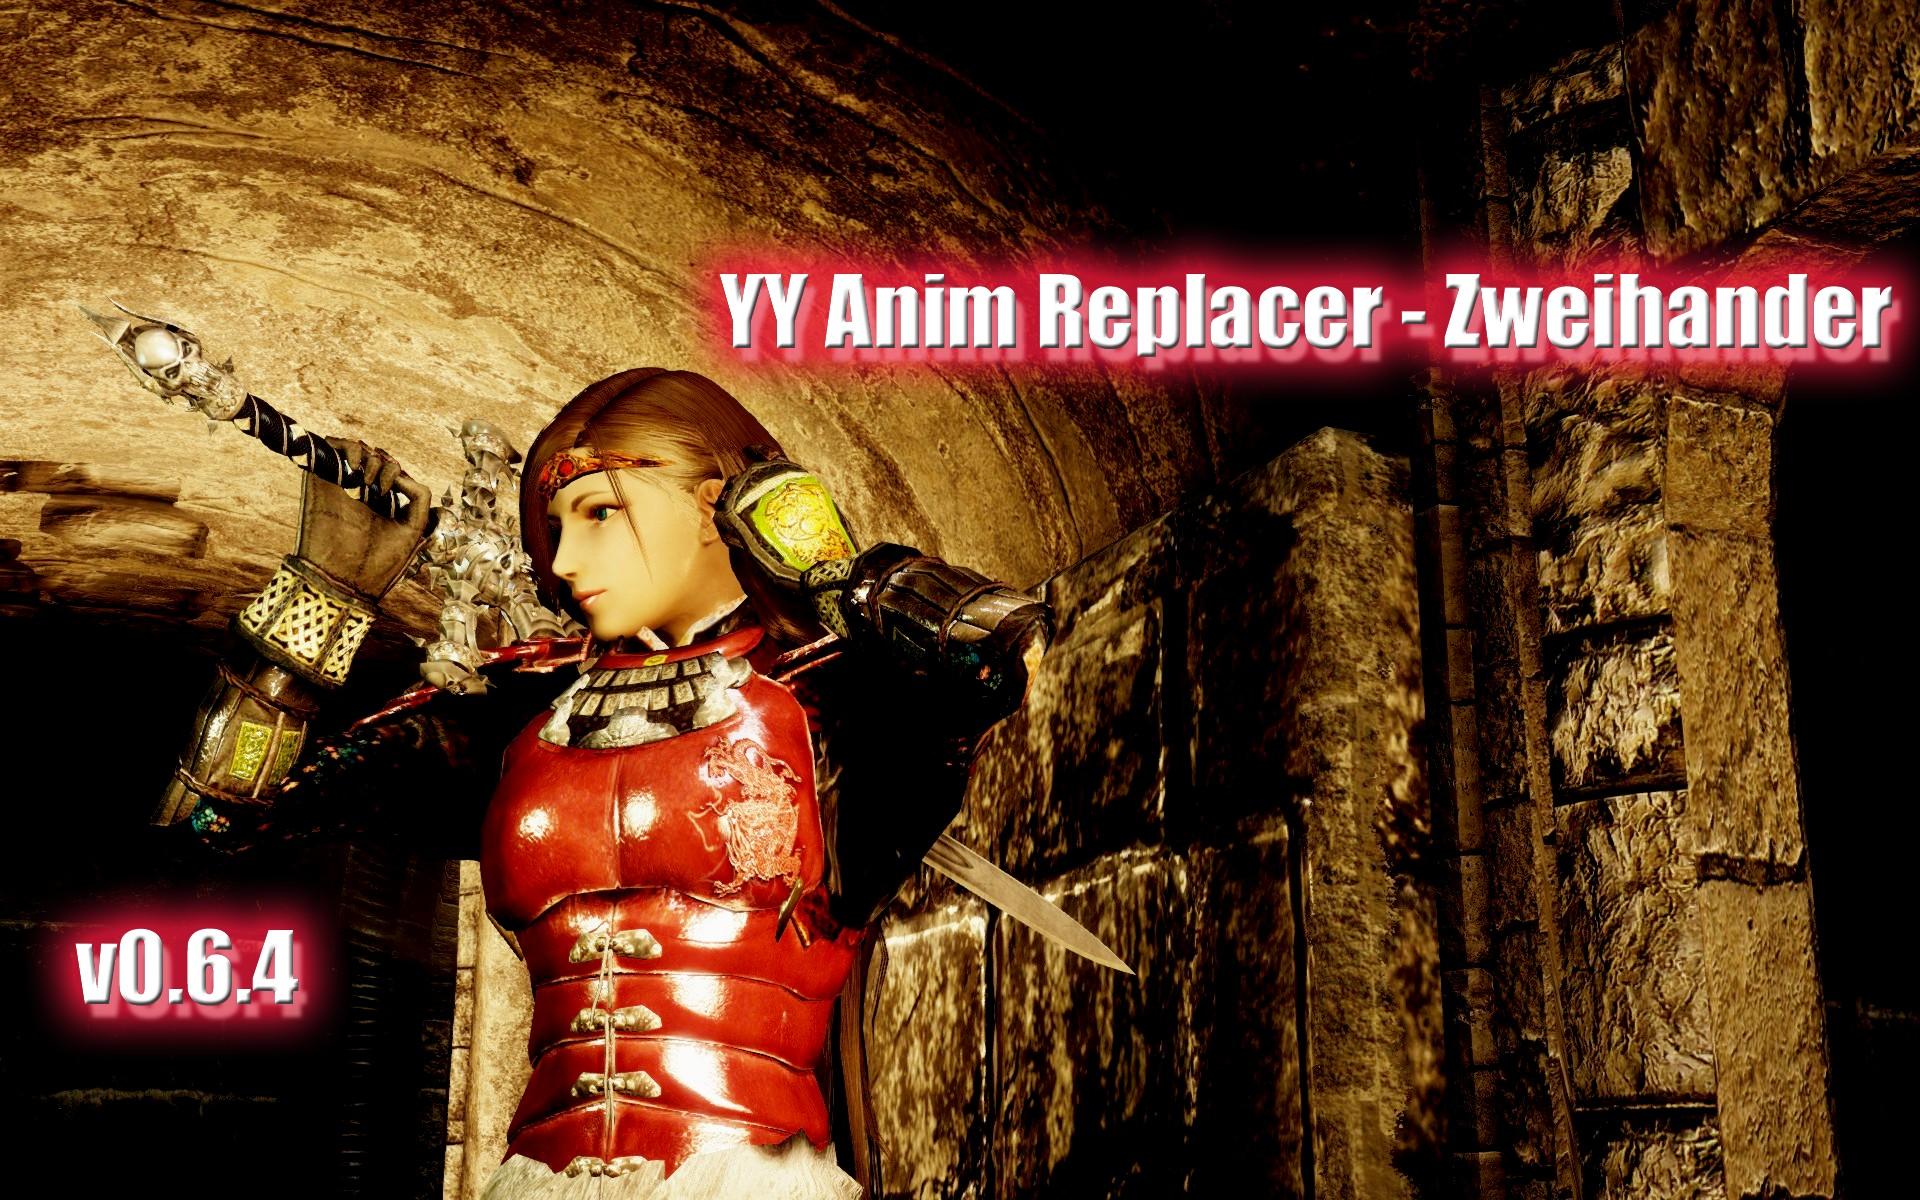 YY_Anim_Replacer_Zweihander.jpg